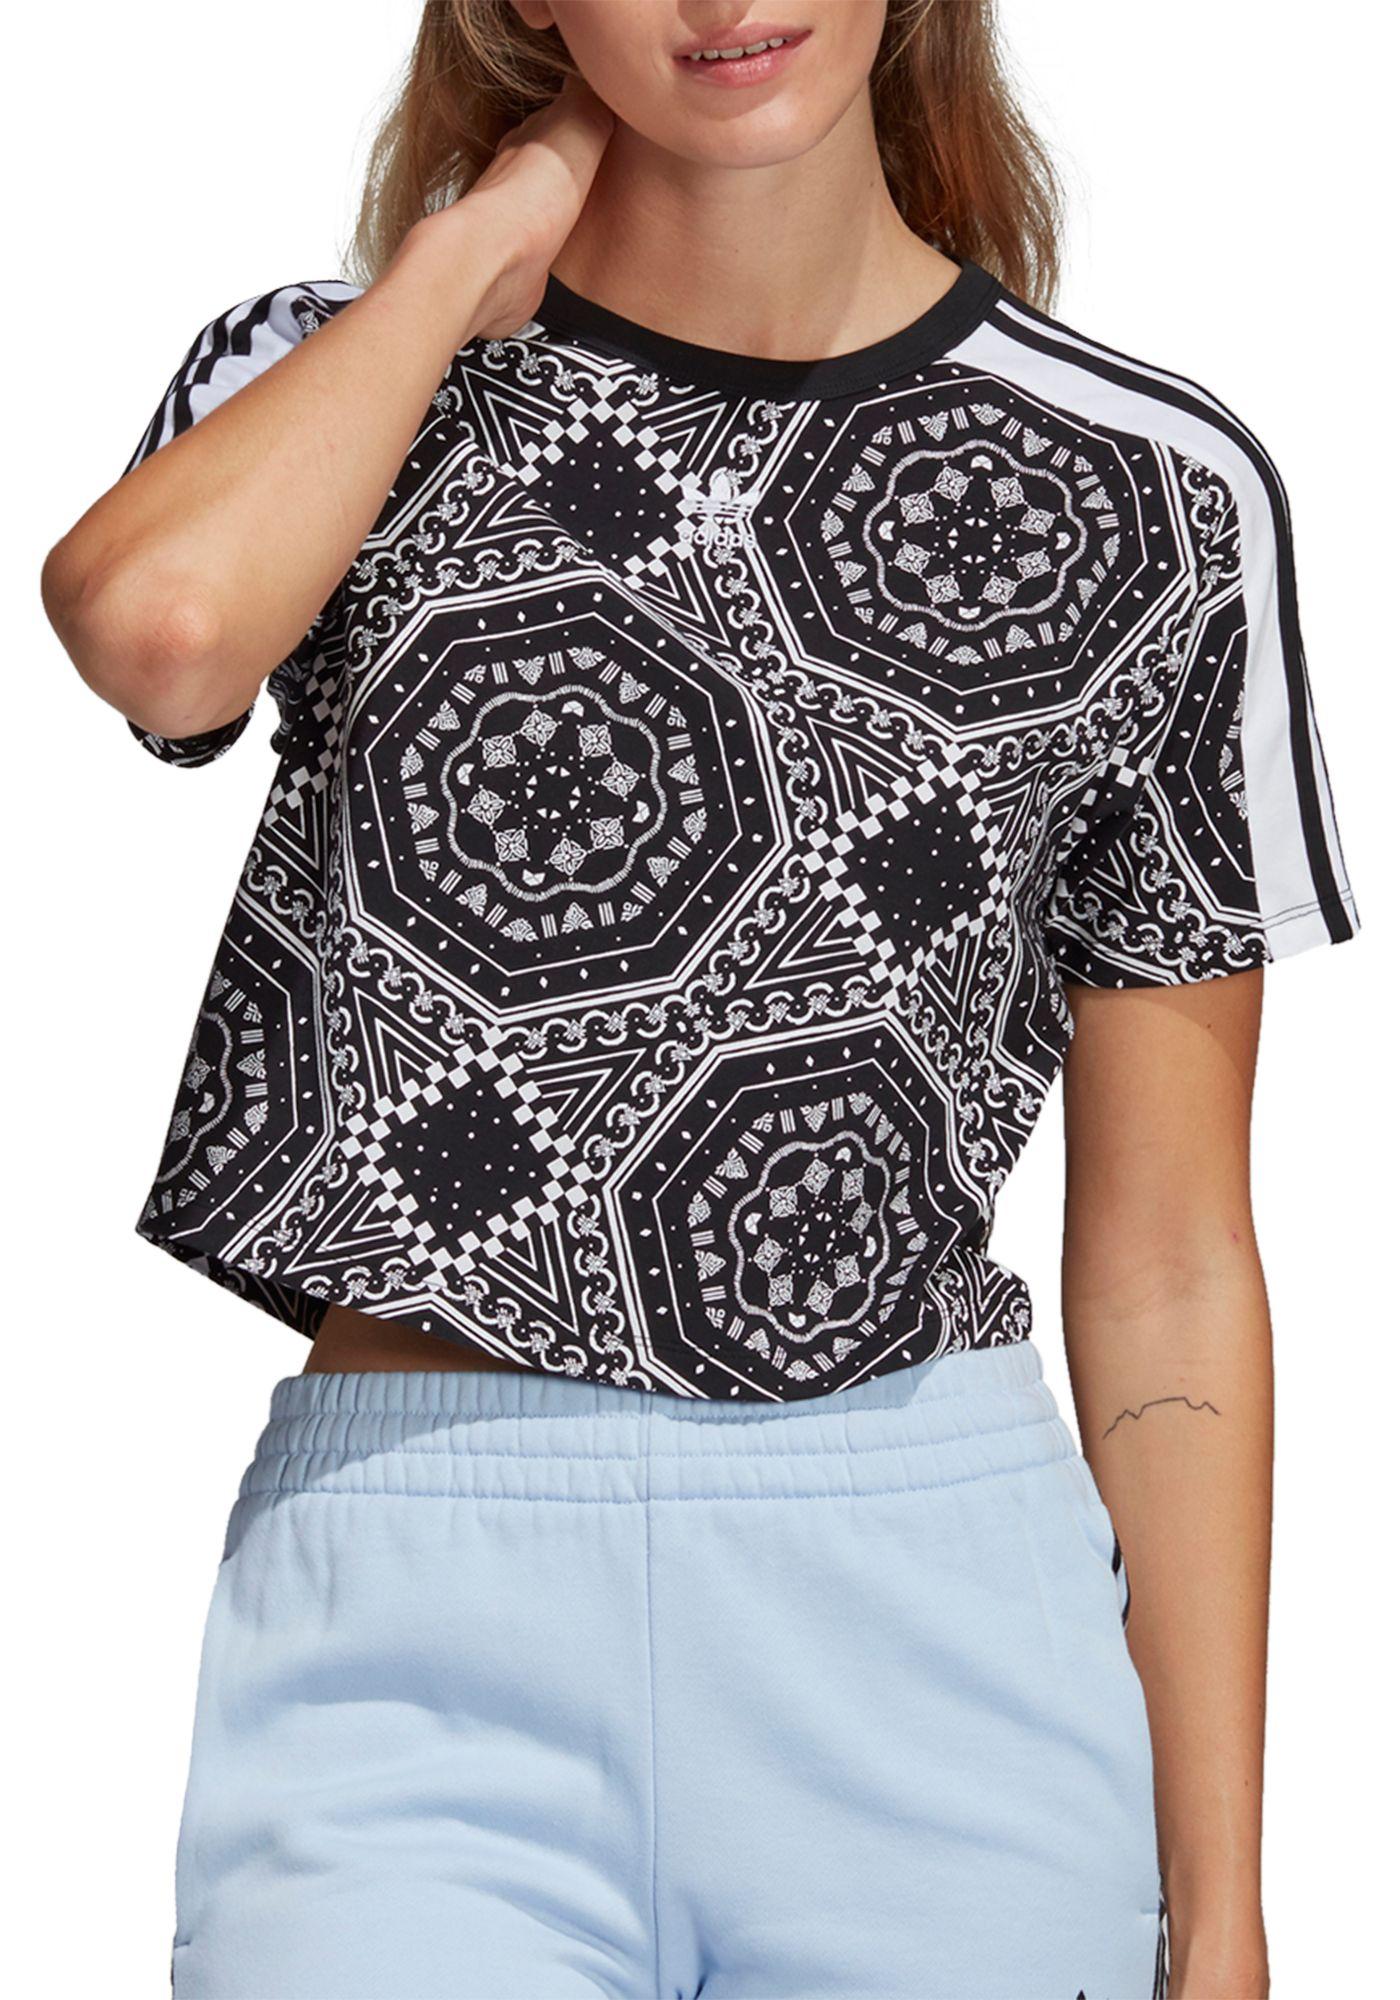 adidas Originals Women's Printed Cropped T-Shirt